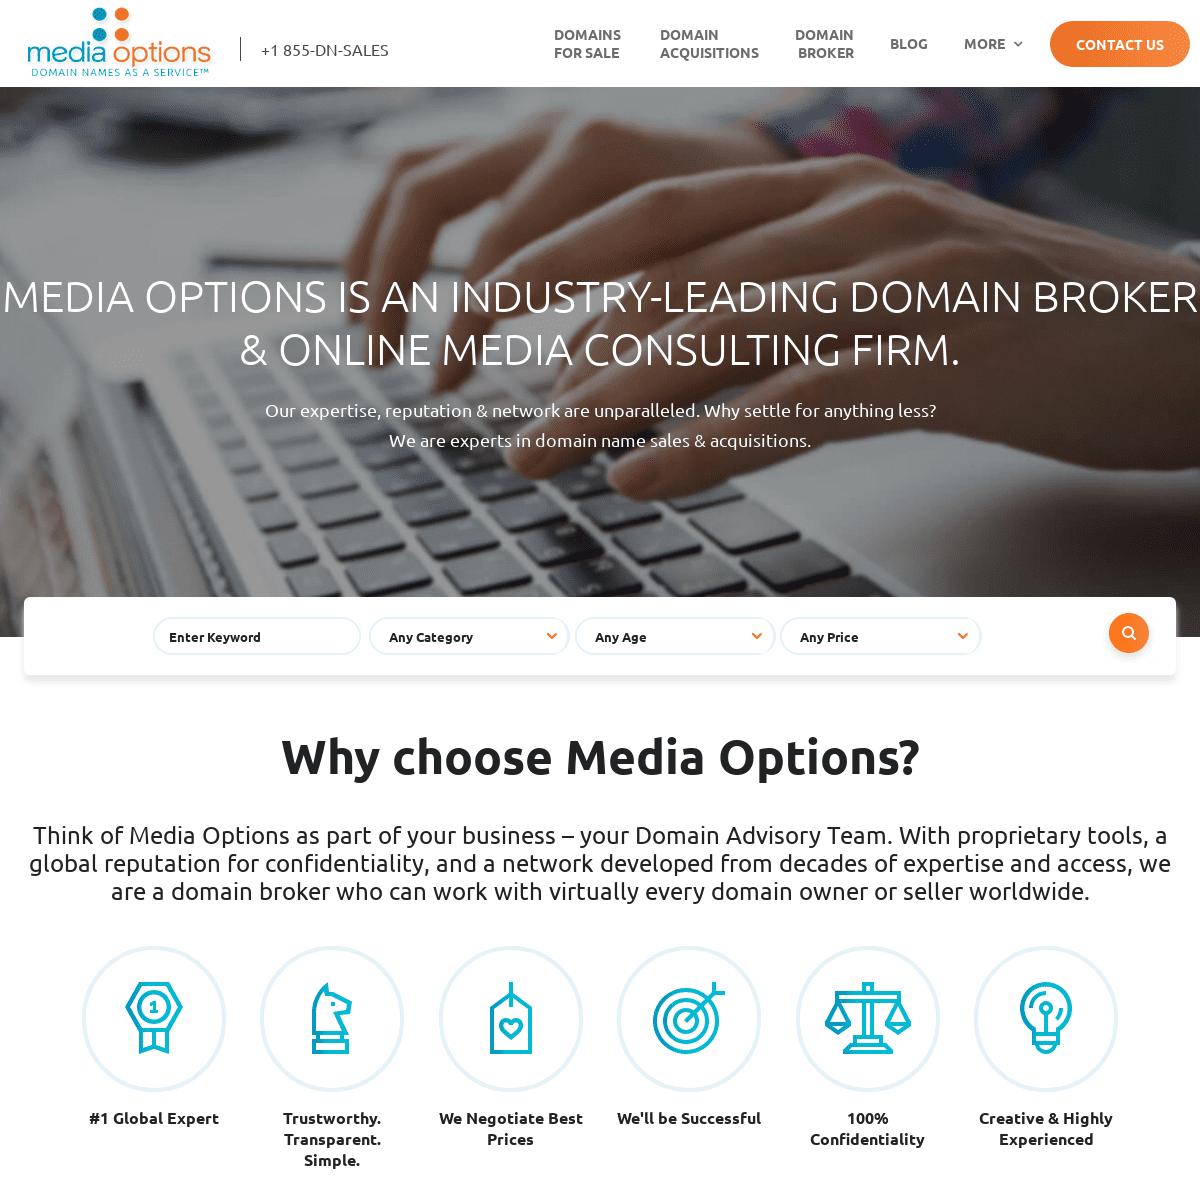 Media Options - The Industry-Leading Domain Broker